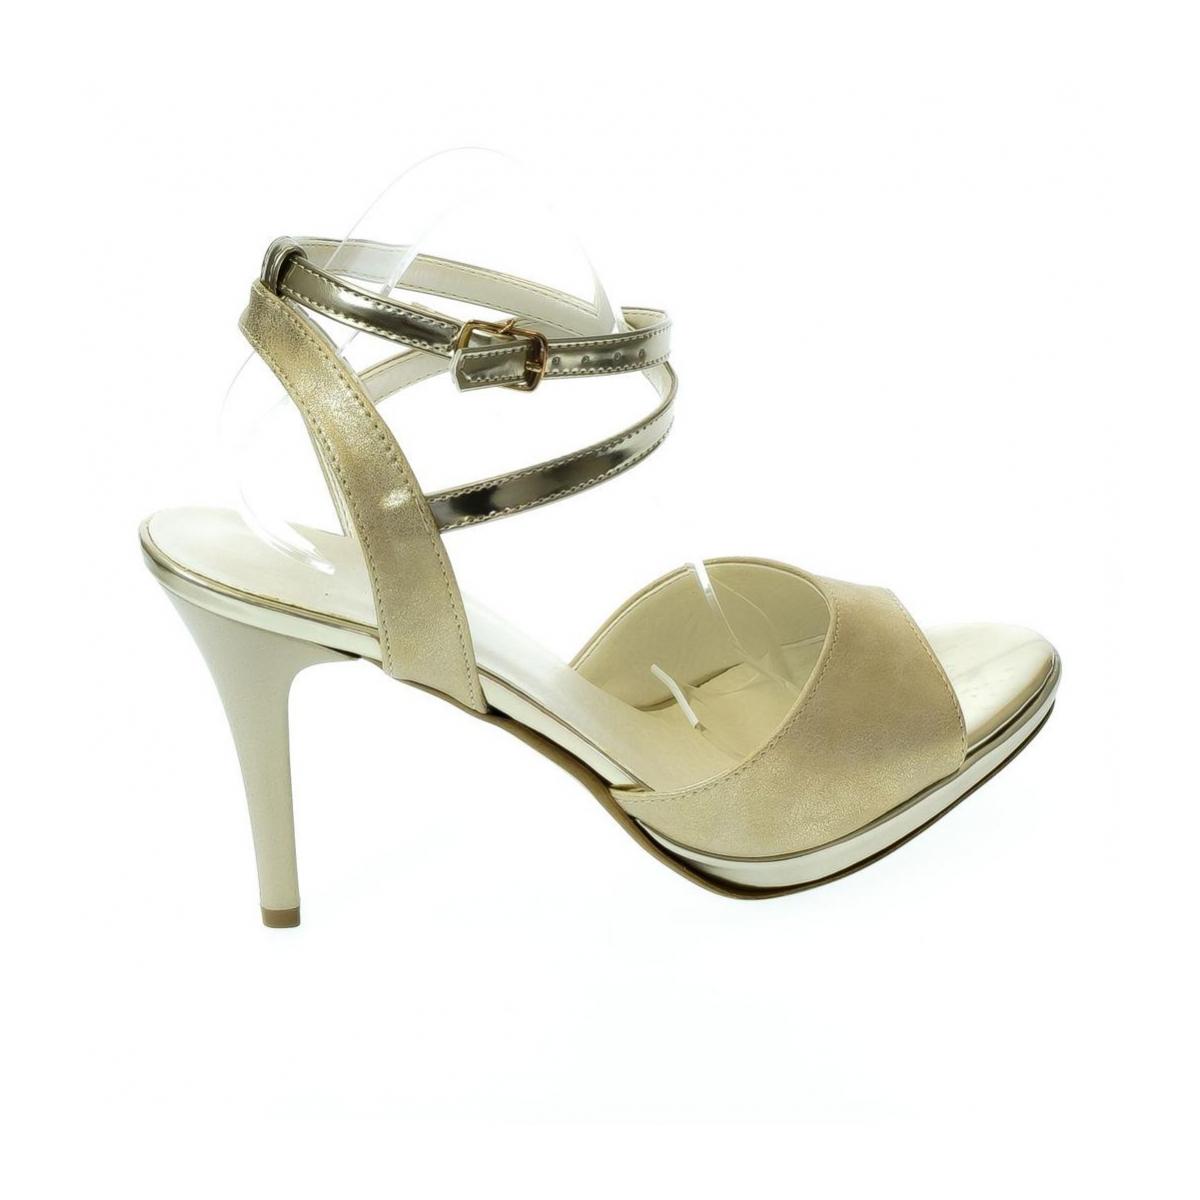 d4bff3e08f94 Dámske zlaté sandále ESMERALDA - 5